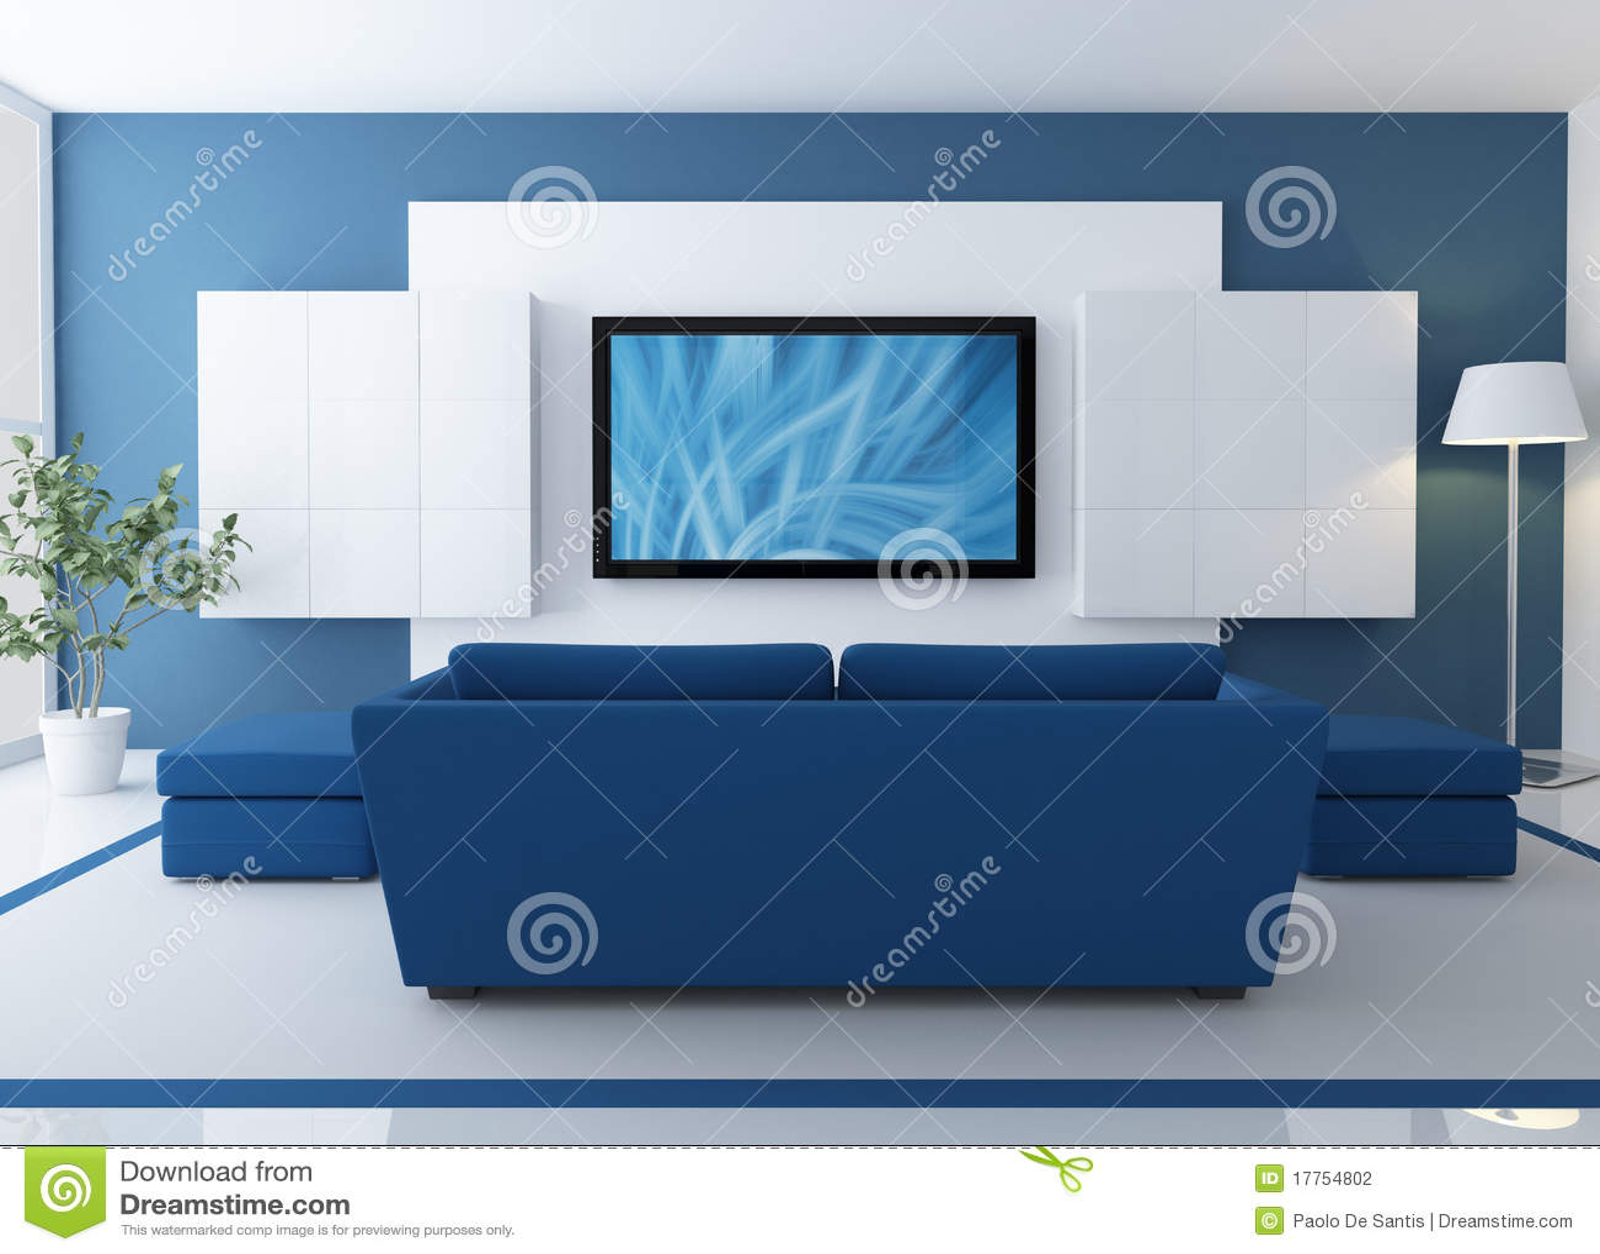 Sala De Estar En Azul ~ Sala De Estar Azul Com Tevê Do Lcd Fotografia de Stock  Imagem